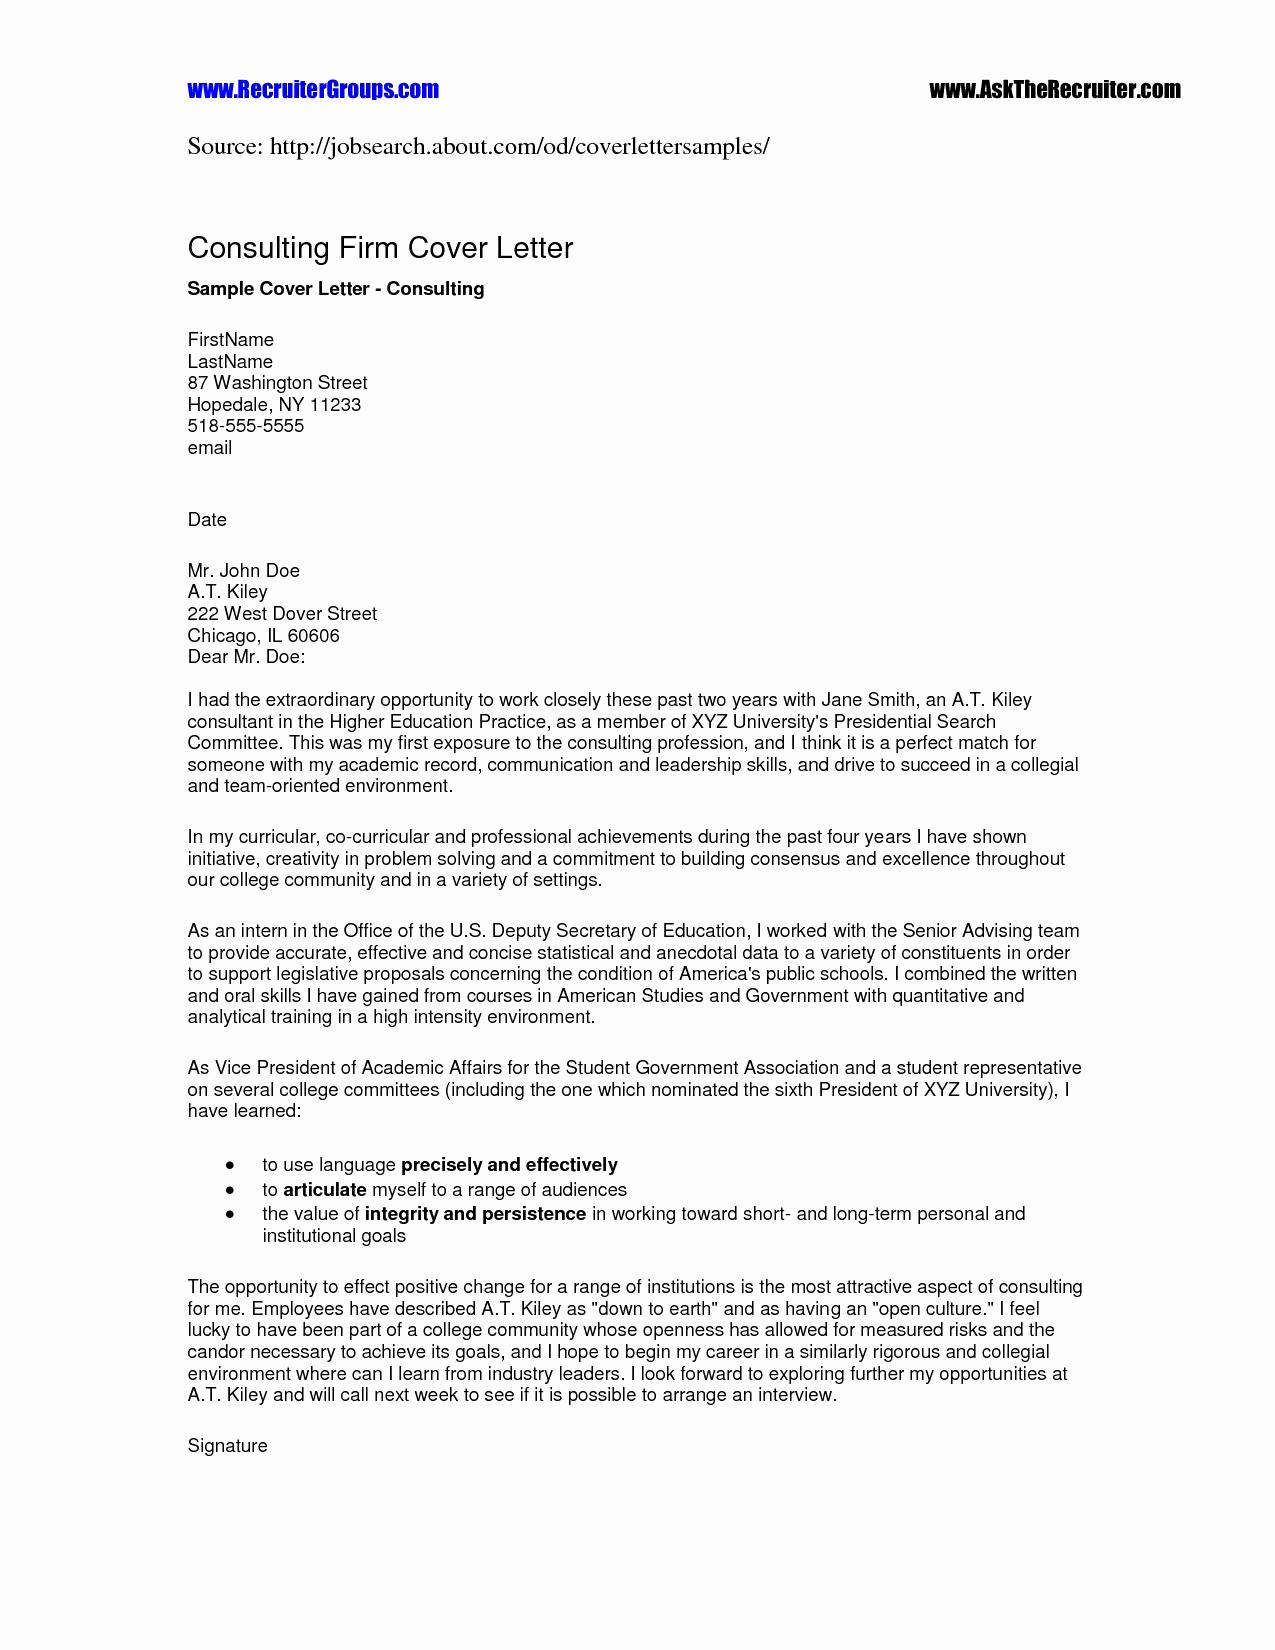 Letter Of Recommendation Letter Template - Personal Re Mendation Letter Template Awesome Cover Letter Sample